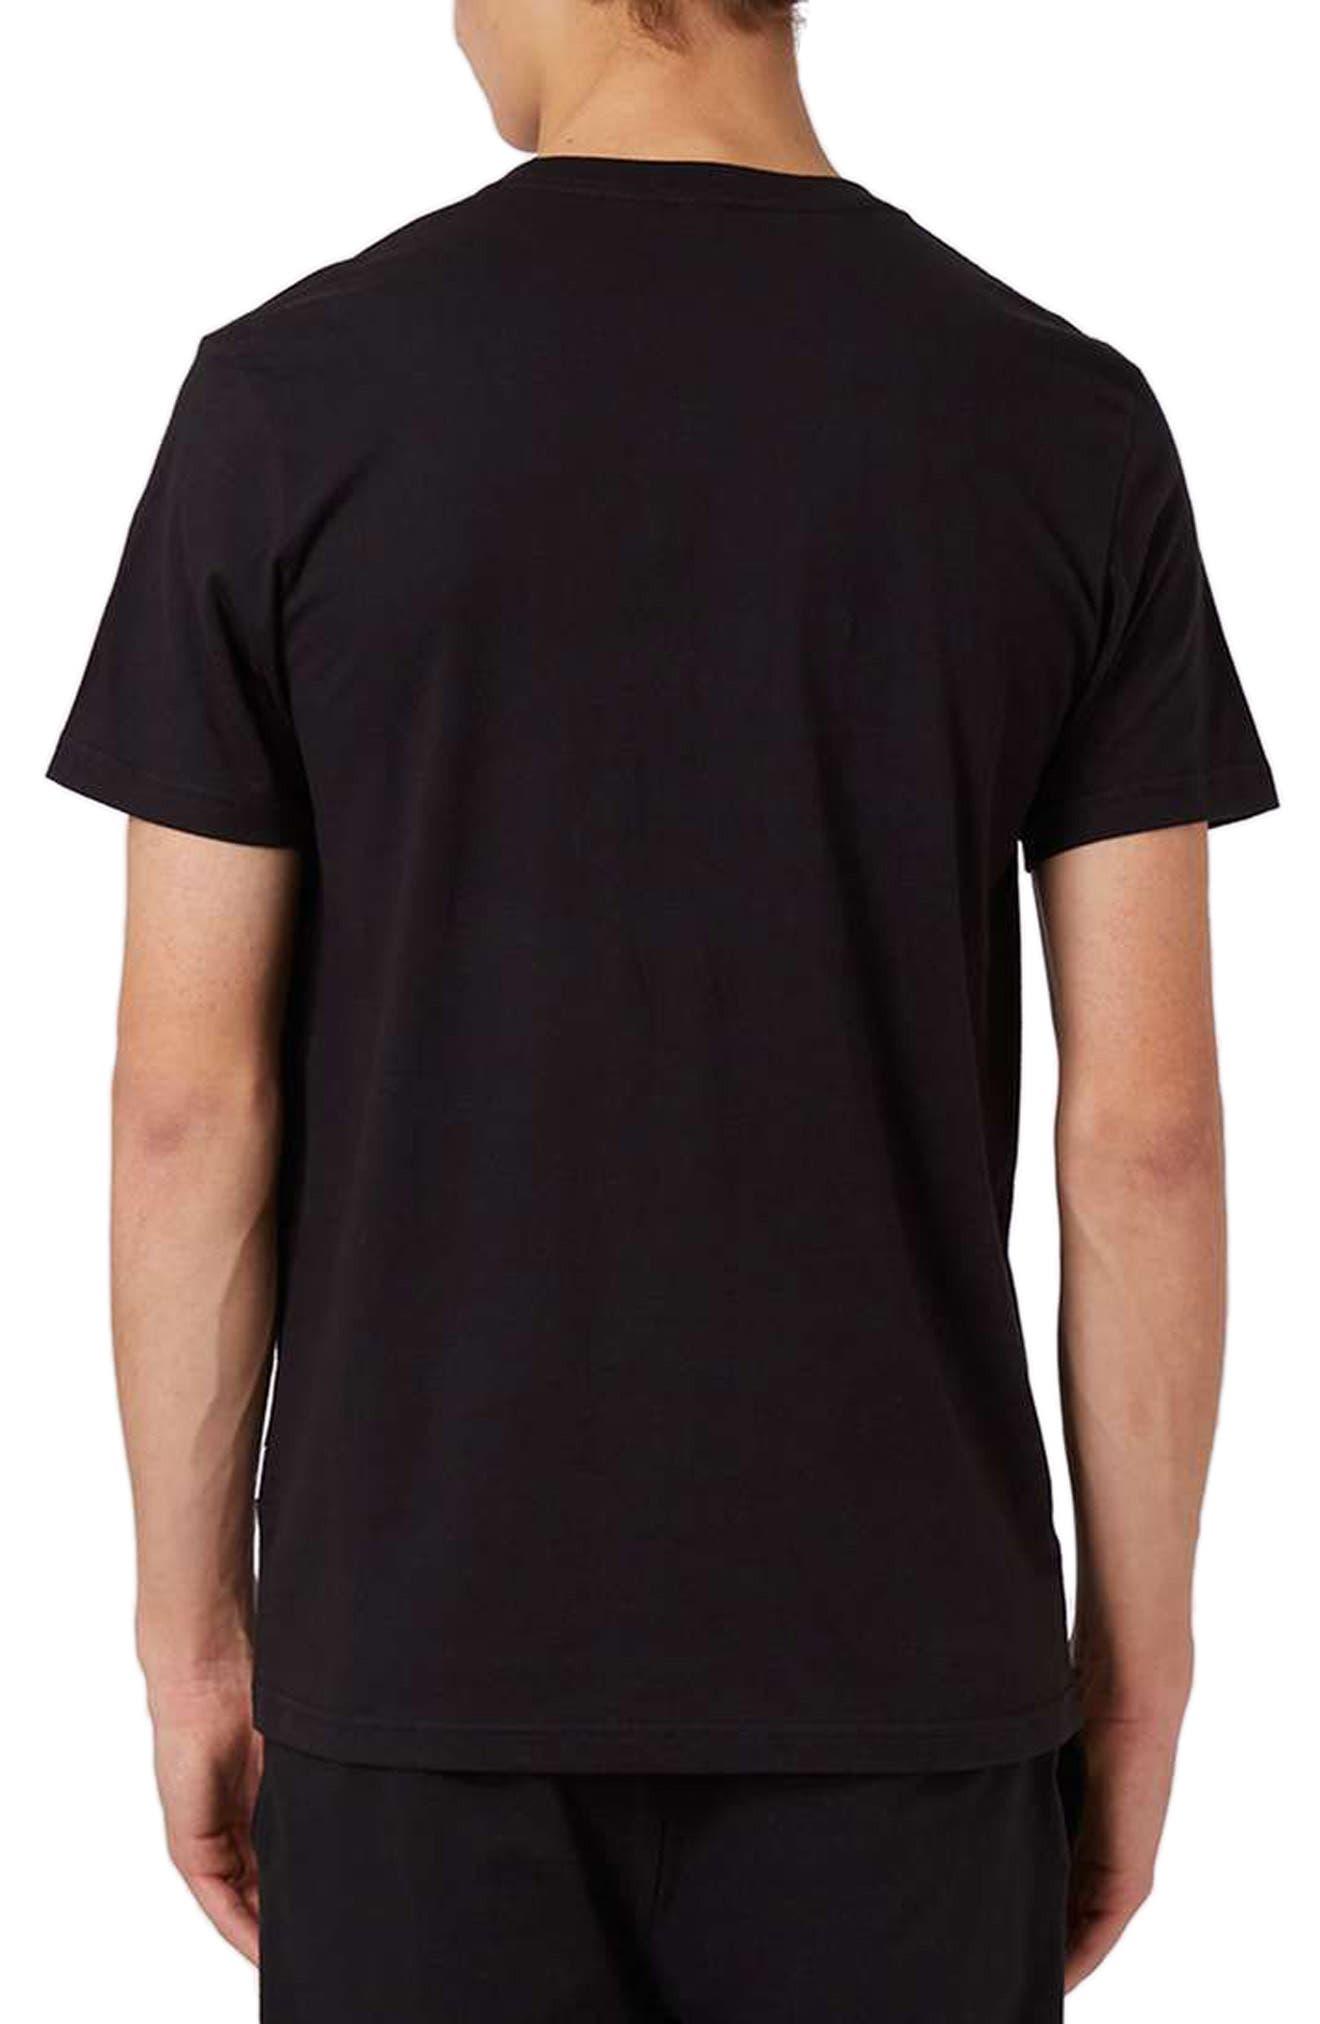 NICCE Graphic T-Shirt,                             Alternate thumbnail 2, color,                             001